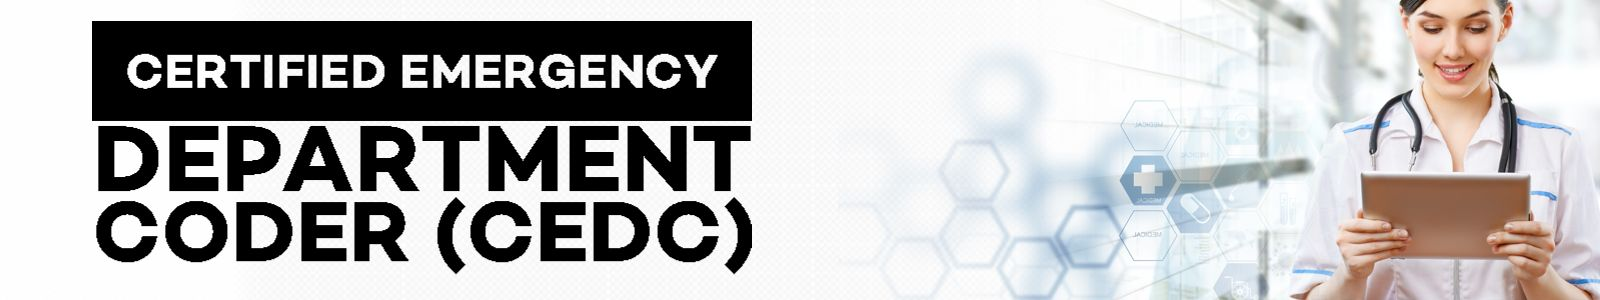 Certified Emergency Department Coder (CEDC)